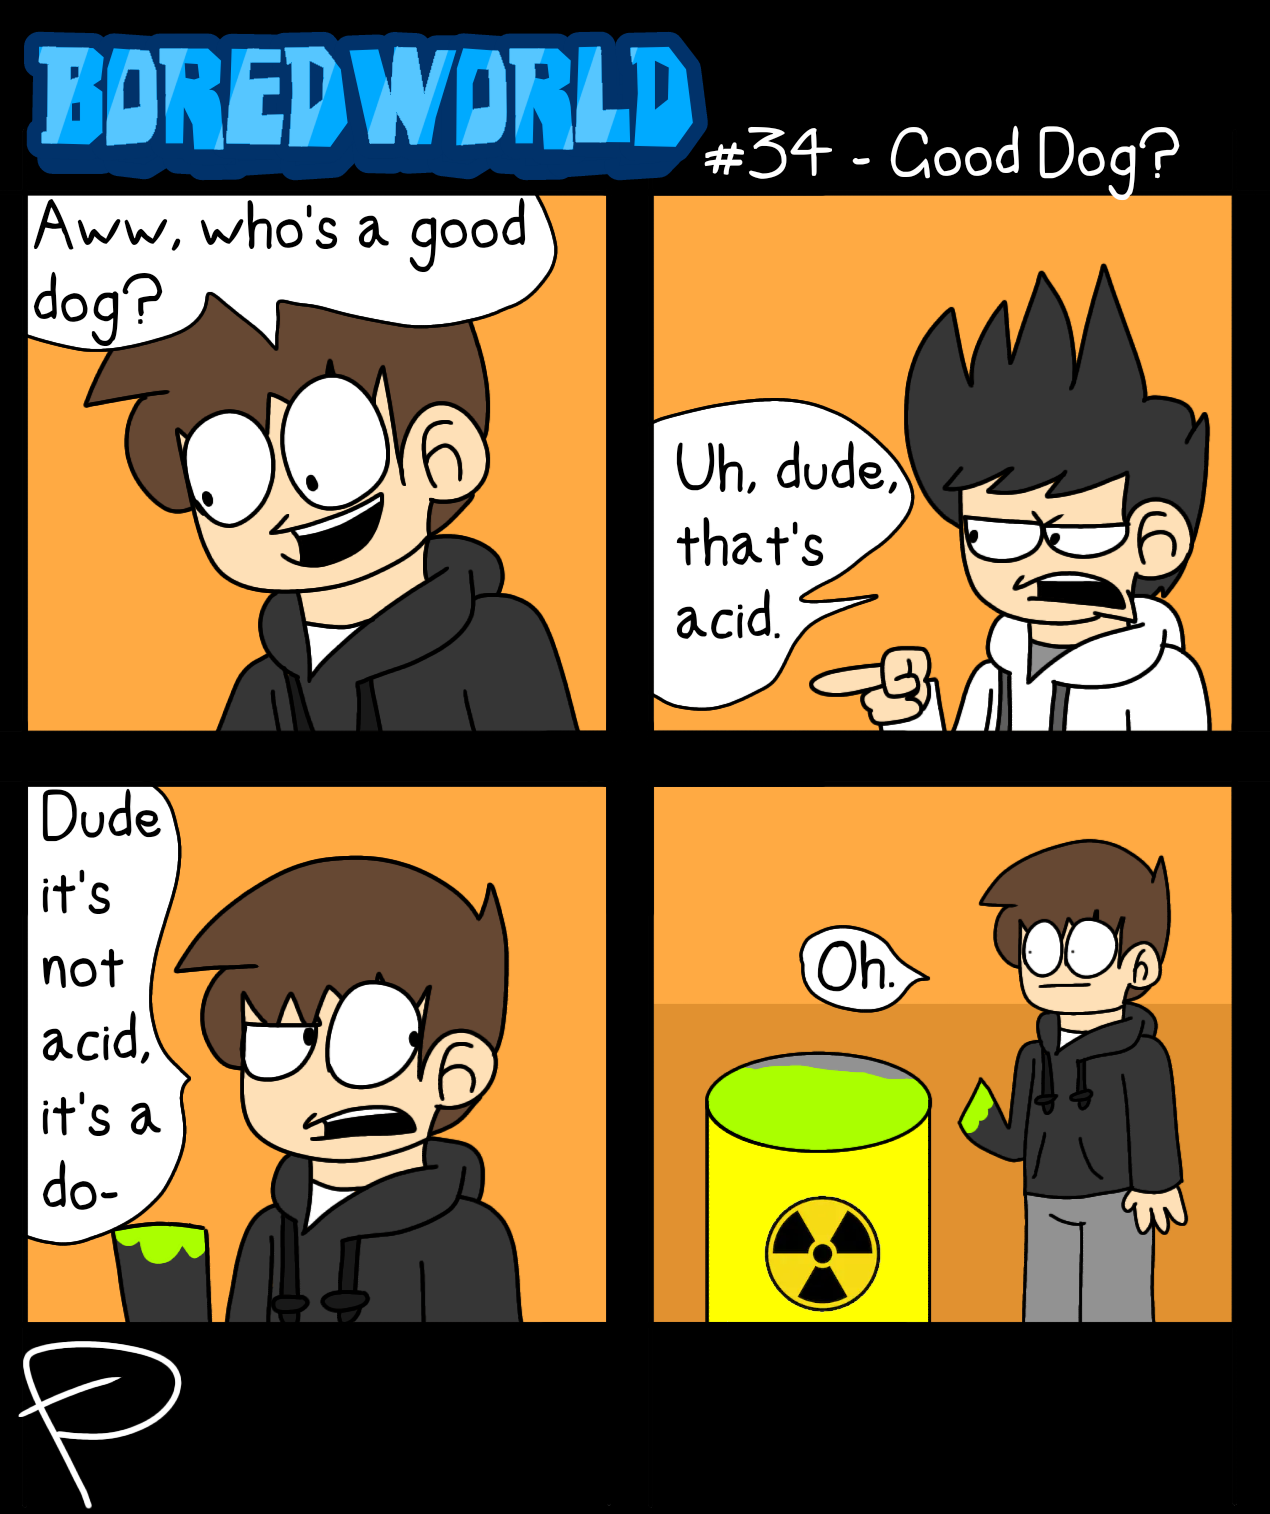 Good Dog?